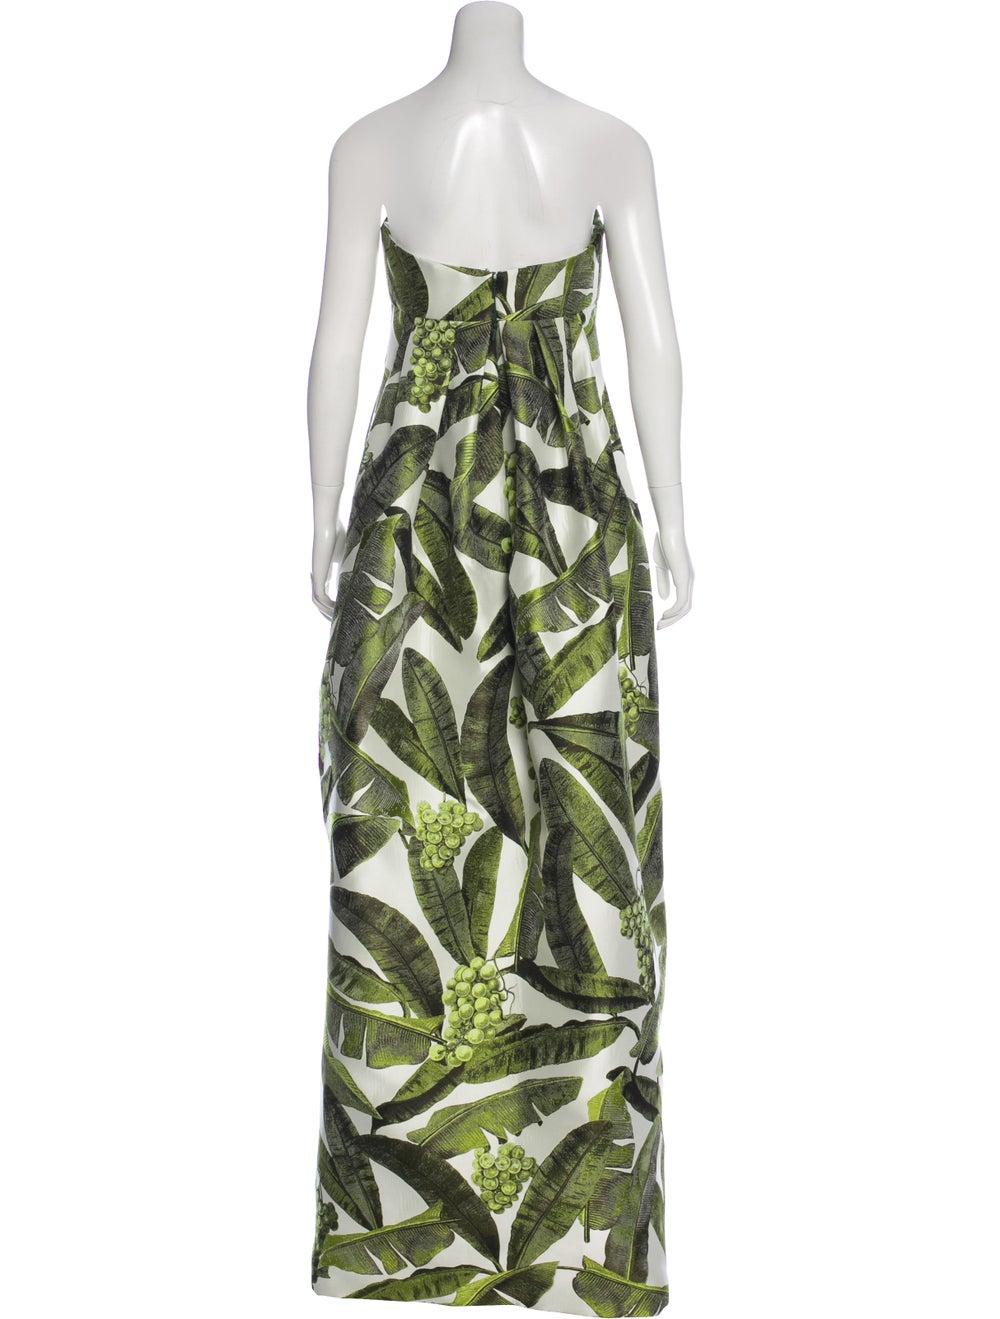 Oscar de la Renta Strapless Maxi Dress multicolor - image 3